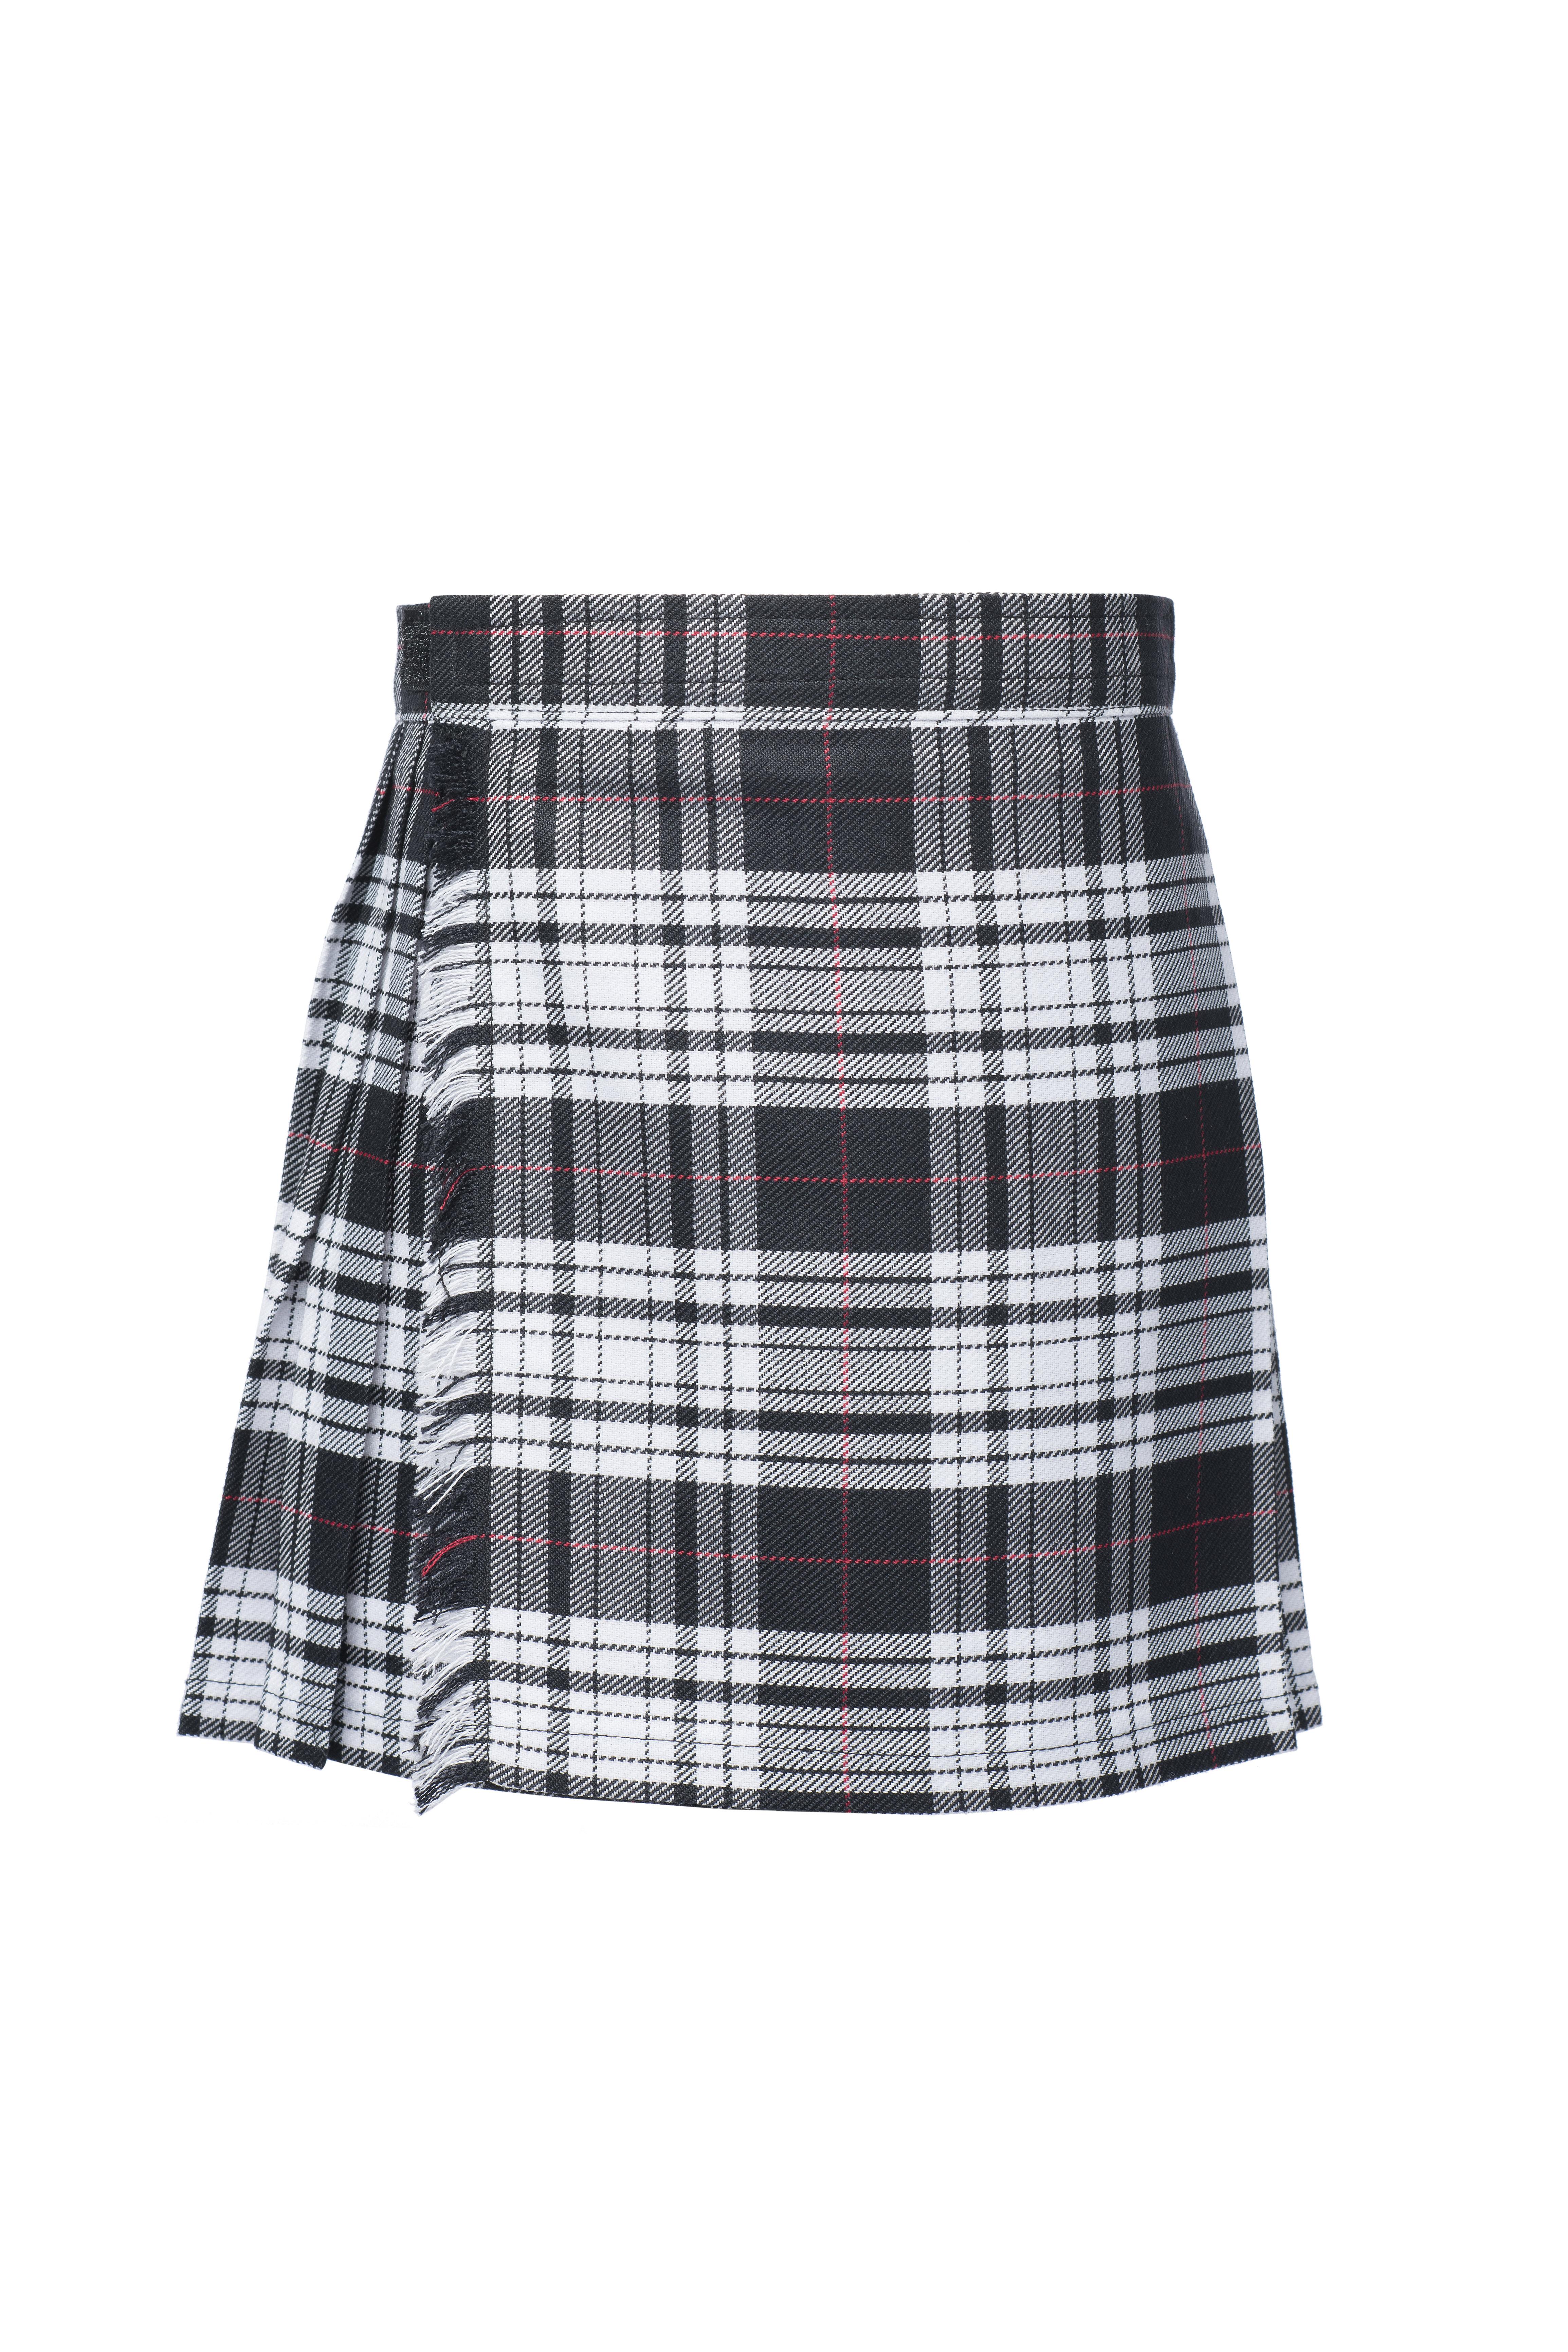 ed2b4c246c366a Baby Kilts - Menzies Dress - Royal and Plaid - Tartan Trousers & Trews